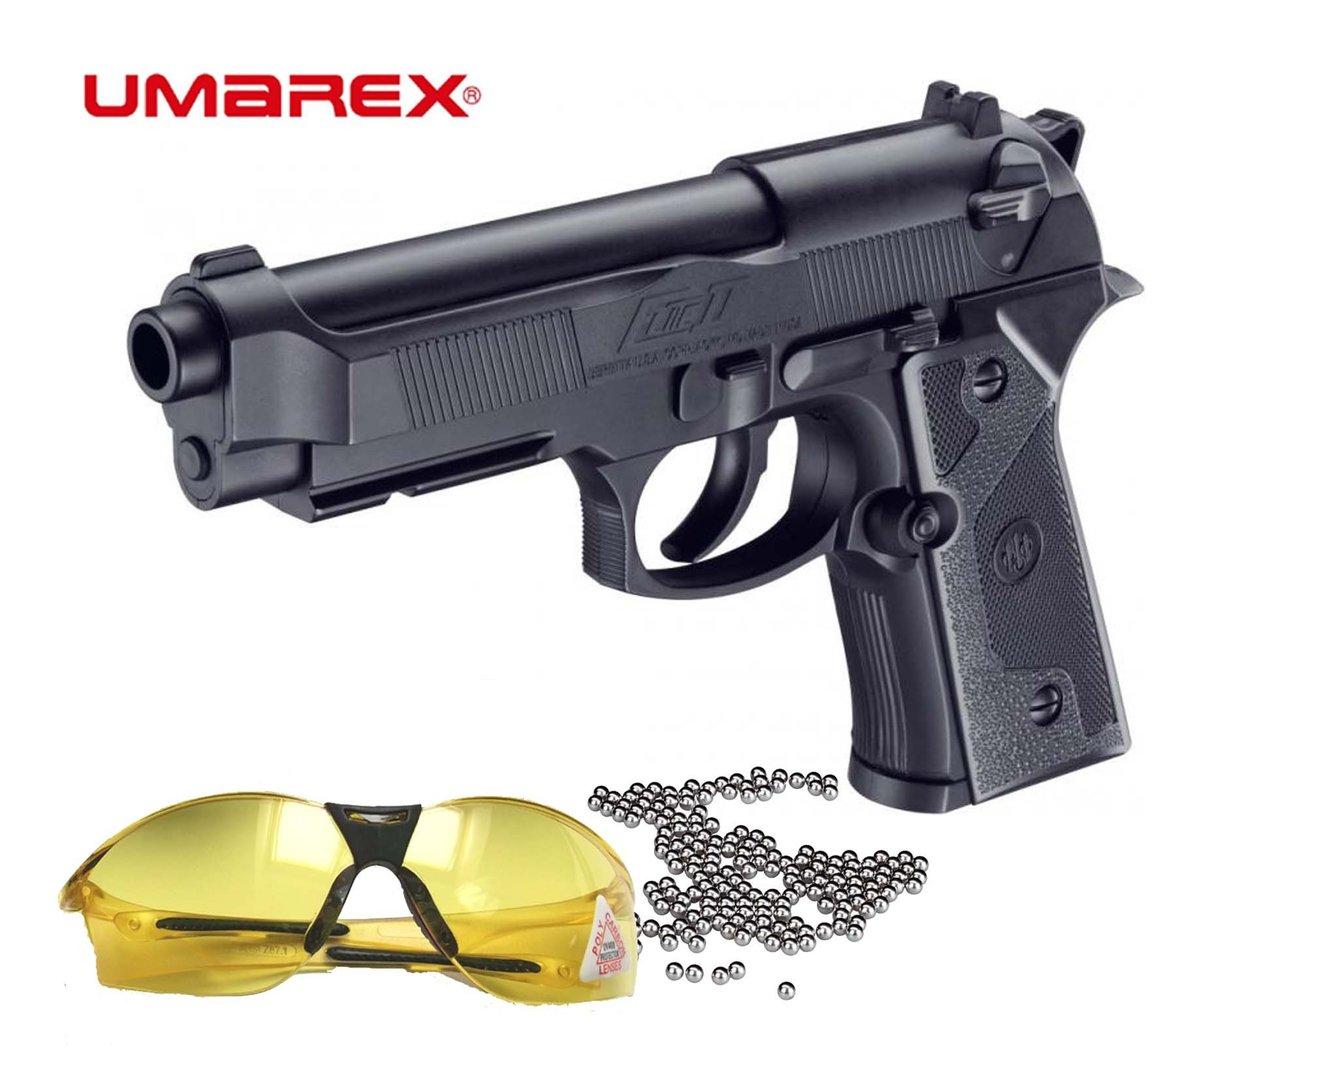 pistolet beretta 92 elite ii umarex 4 5 mm 58090 vente de pistolet bille airsoft. Black Bedroom Furniture Sets. Home Design Ideas